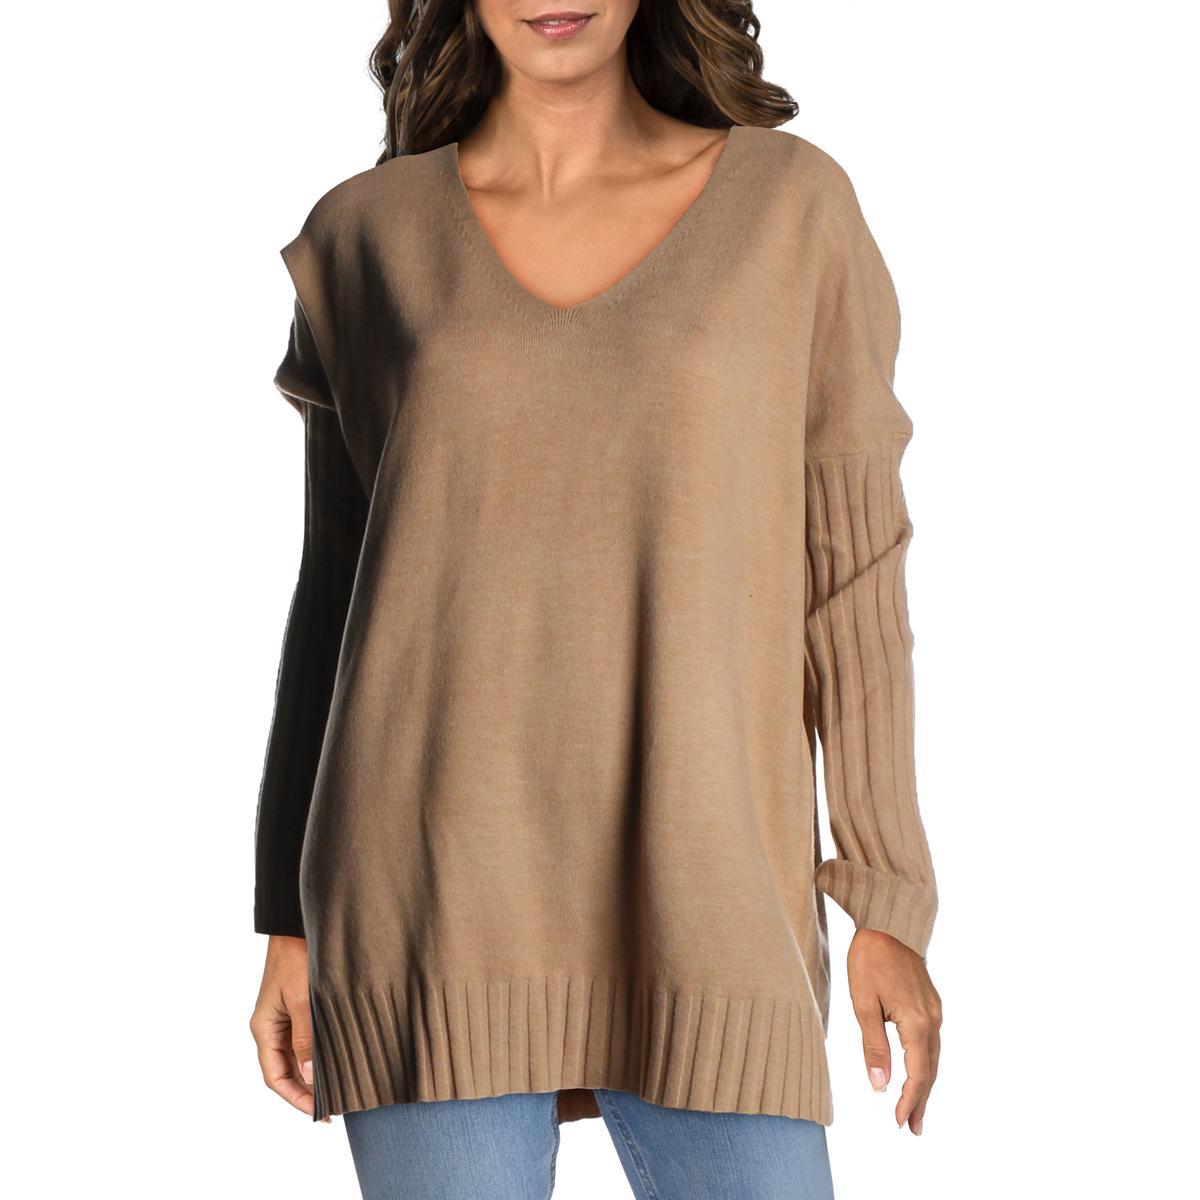 INC Womens Tie-Dye V-Neck Slub Knit Pullover Sweater Plus BHFO 1340